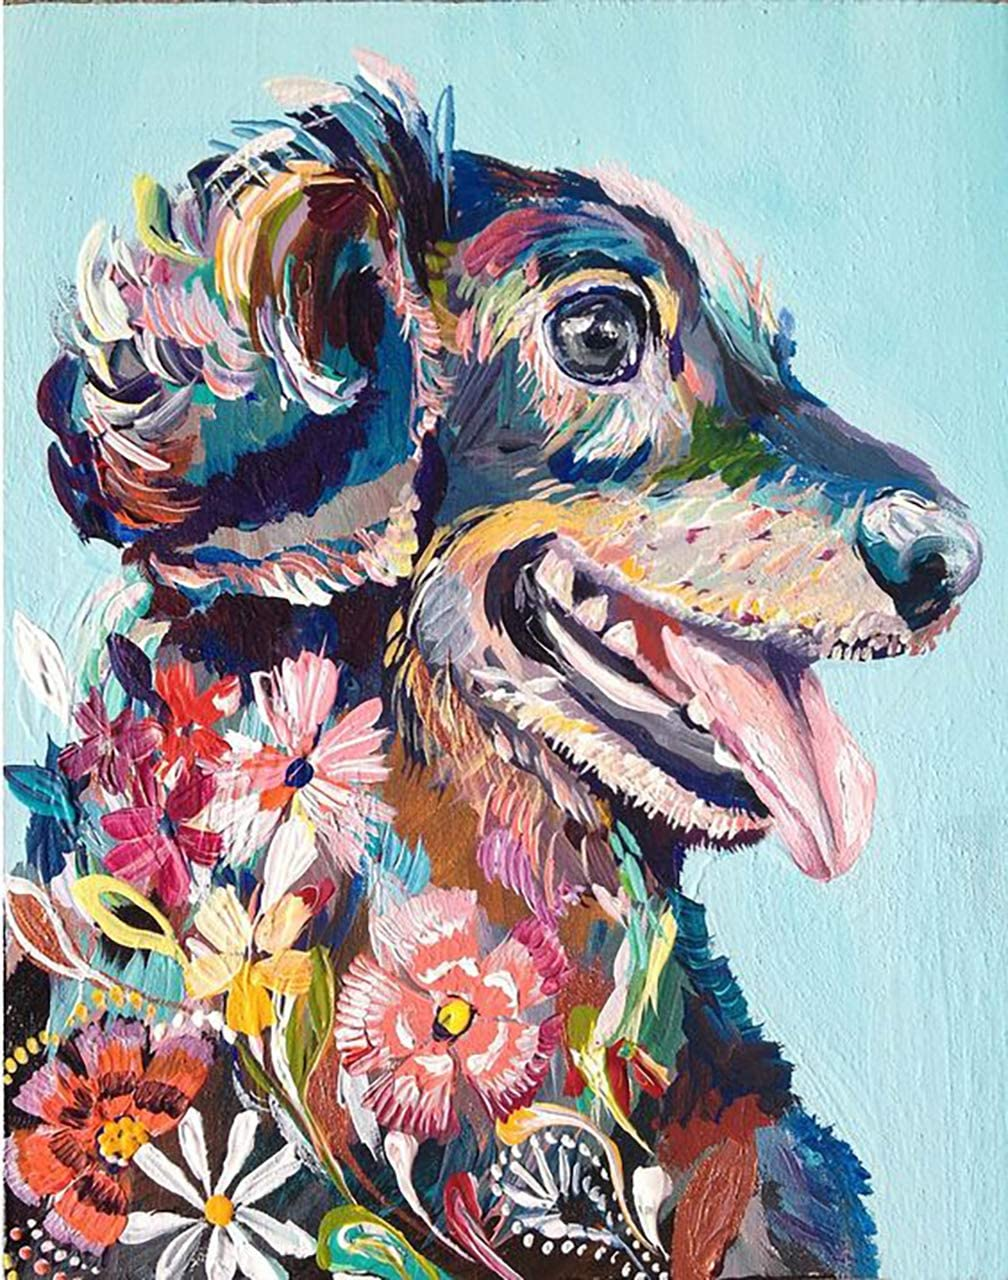 5D Diamond Painting Full Drill Embroidery Cross Stitch Kit Dogs Flower Art Decor